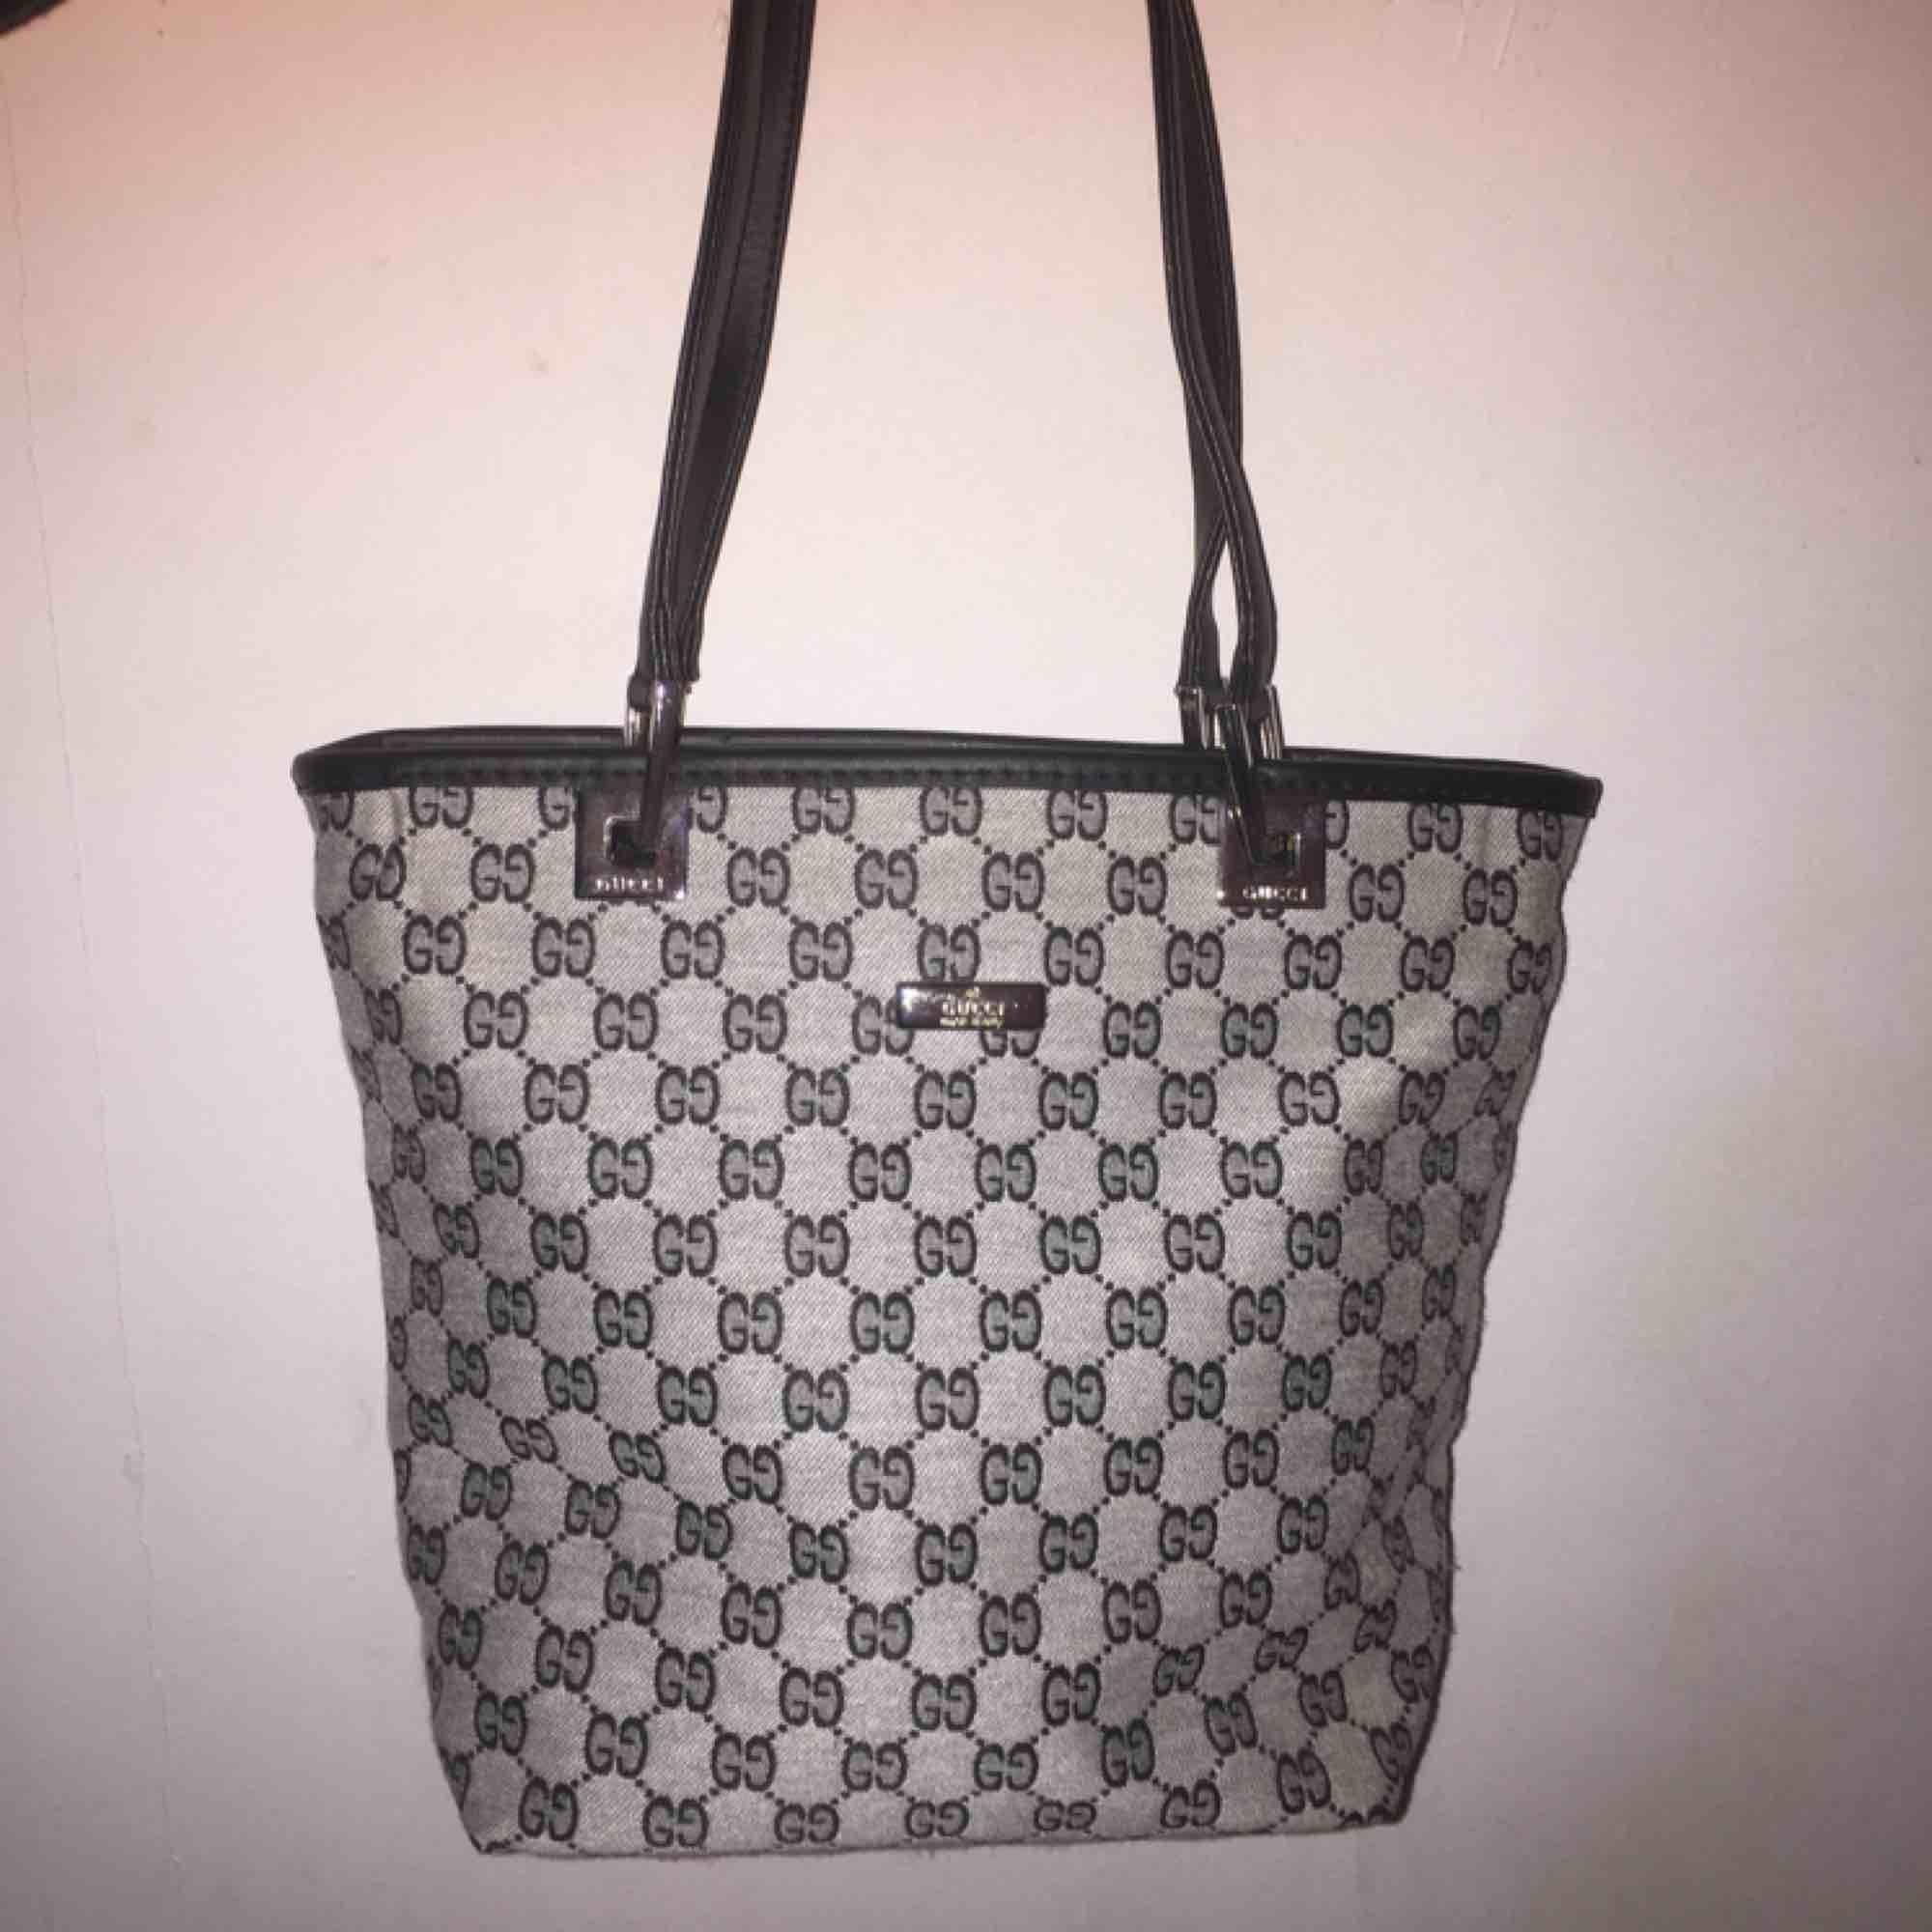 Small non authentic monogram bag, very cute, zipper works. GG. Realistic. Väskor.